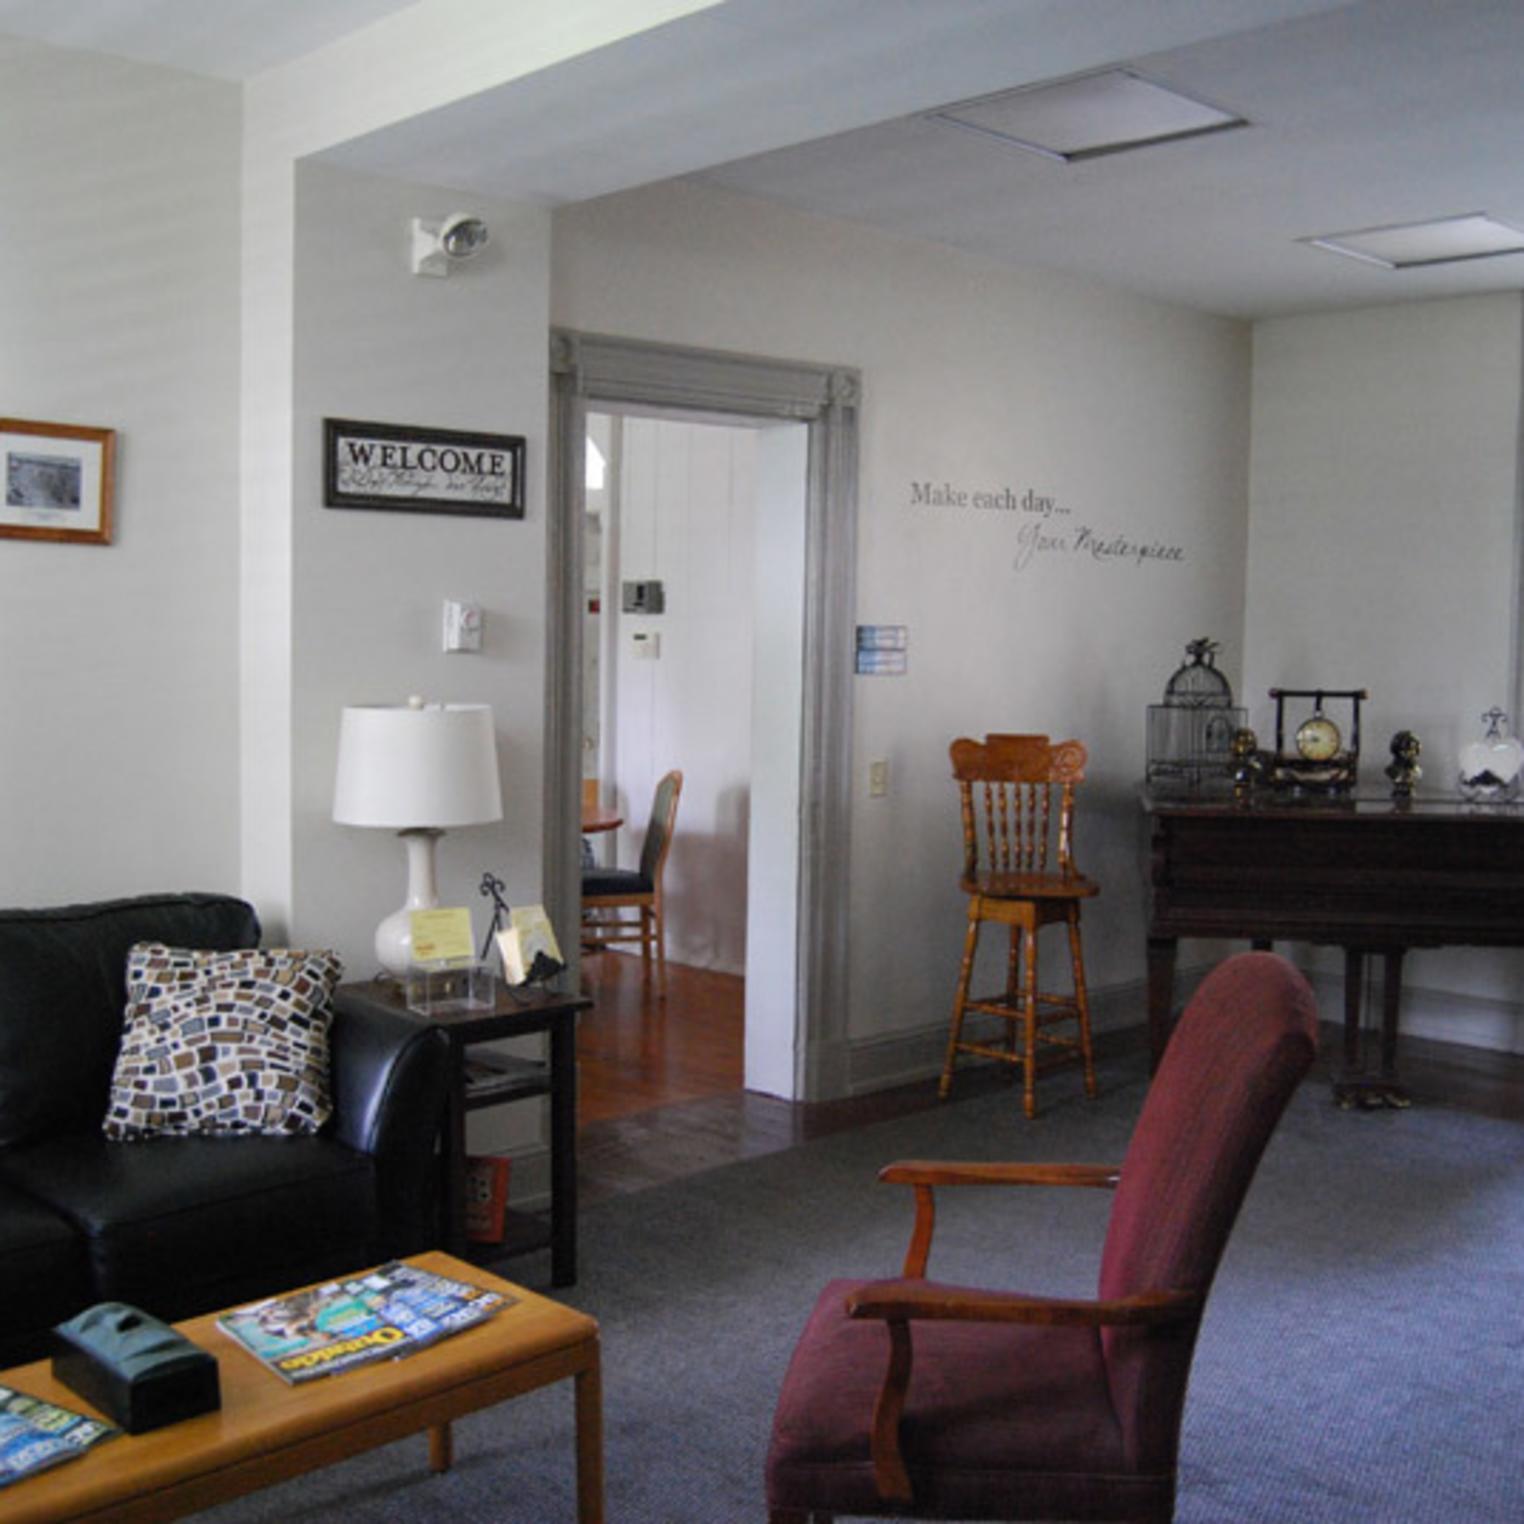 Ironmaster's Mansion Seating Area/Lounge